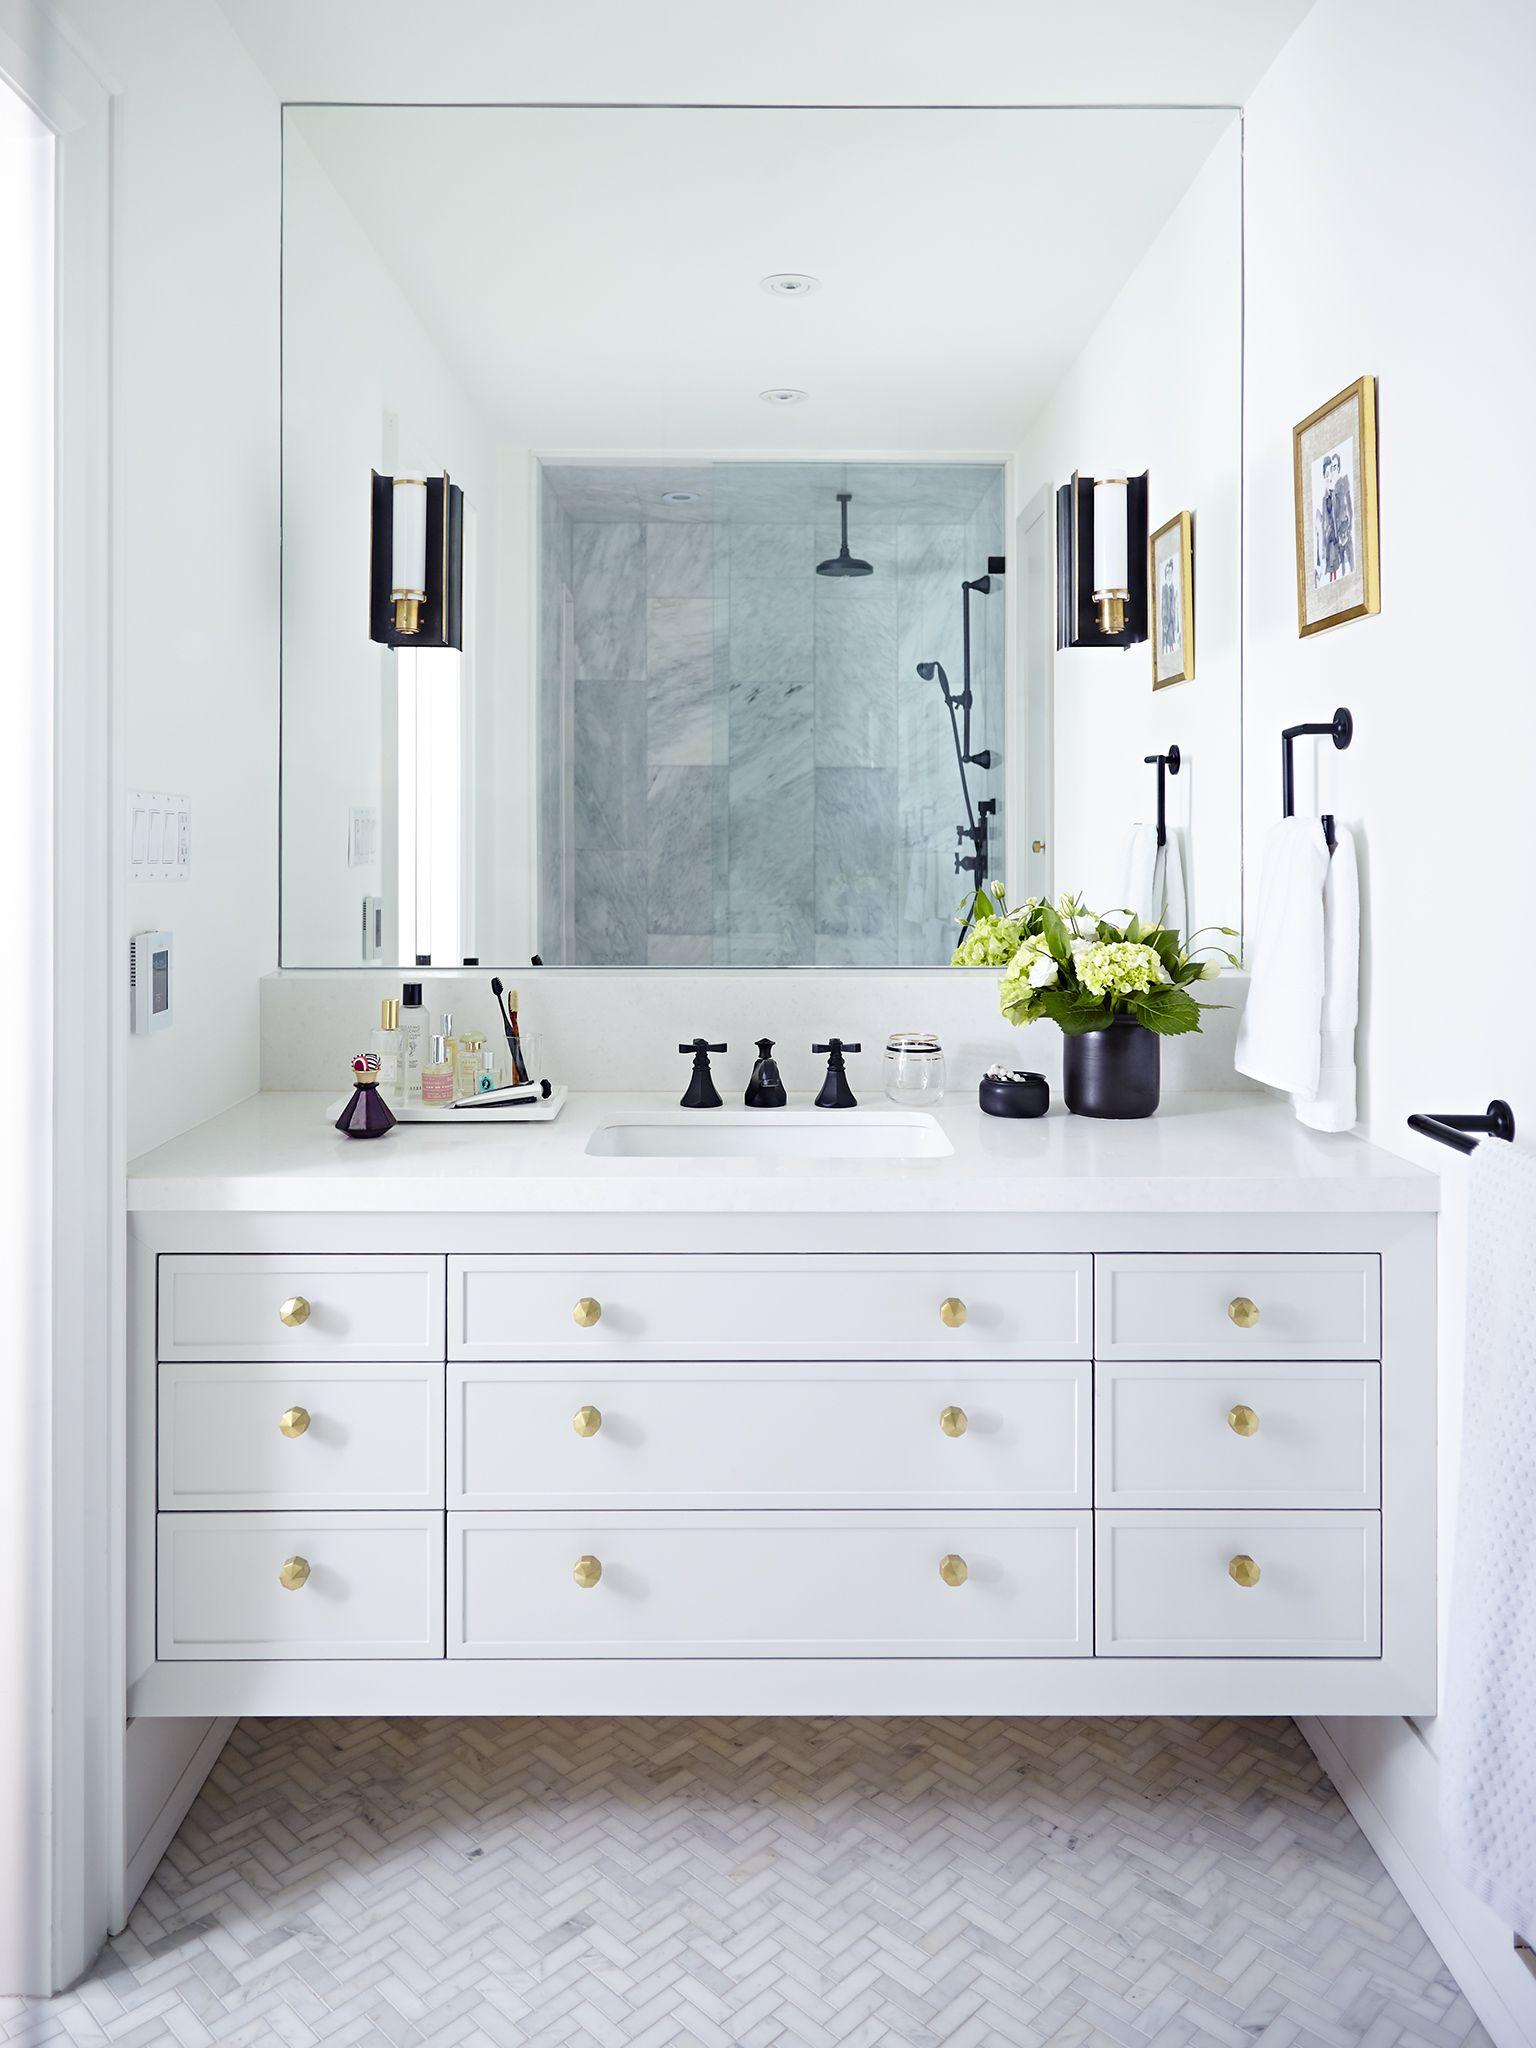 Beautiful All White Bathroom Design With Chevron Floor Detailing